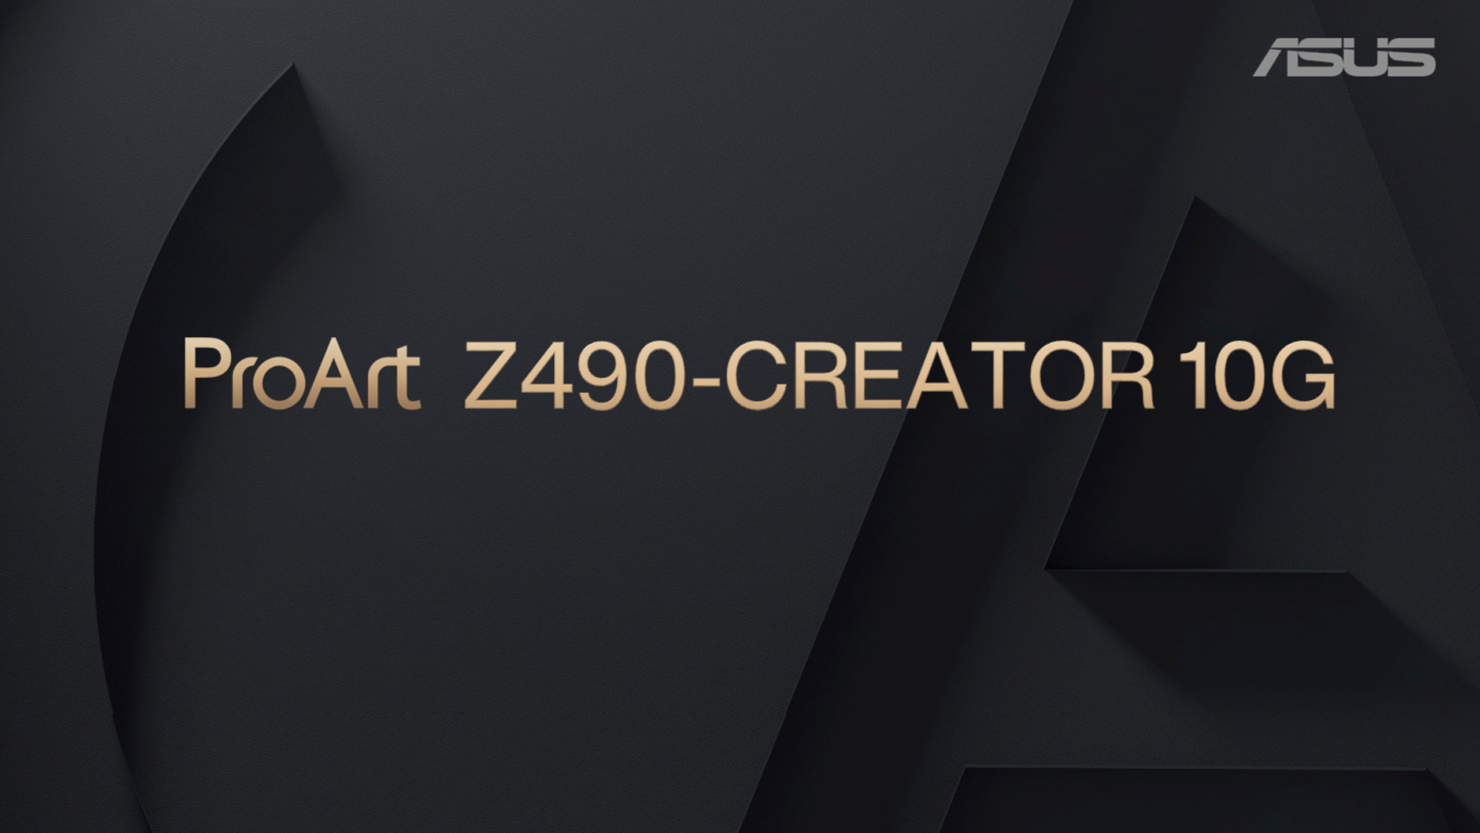 2020-04-25_2-09-58-custom